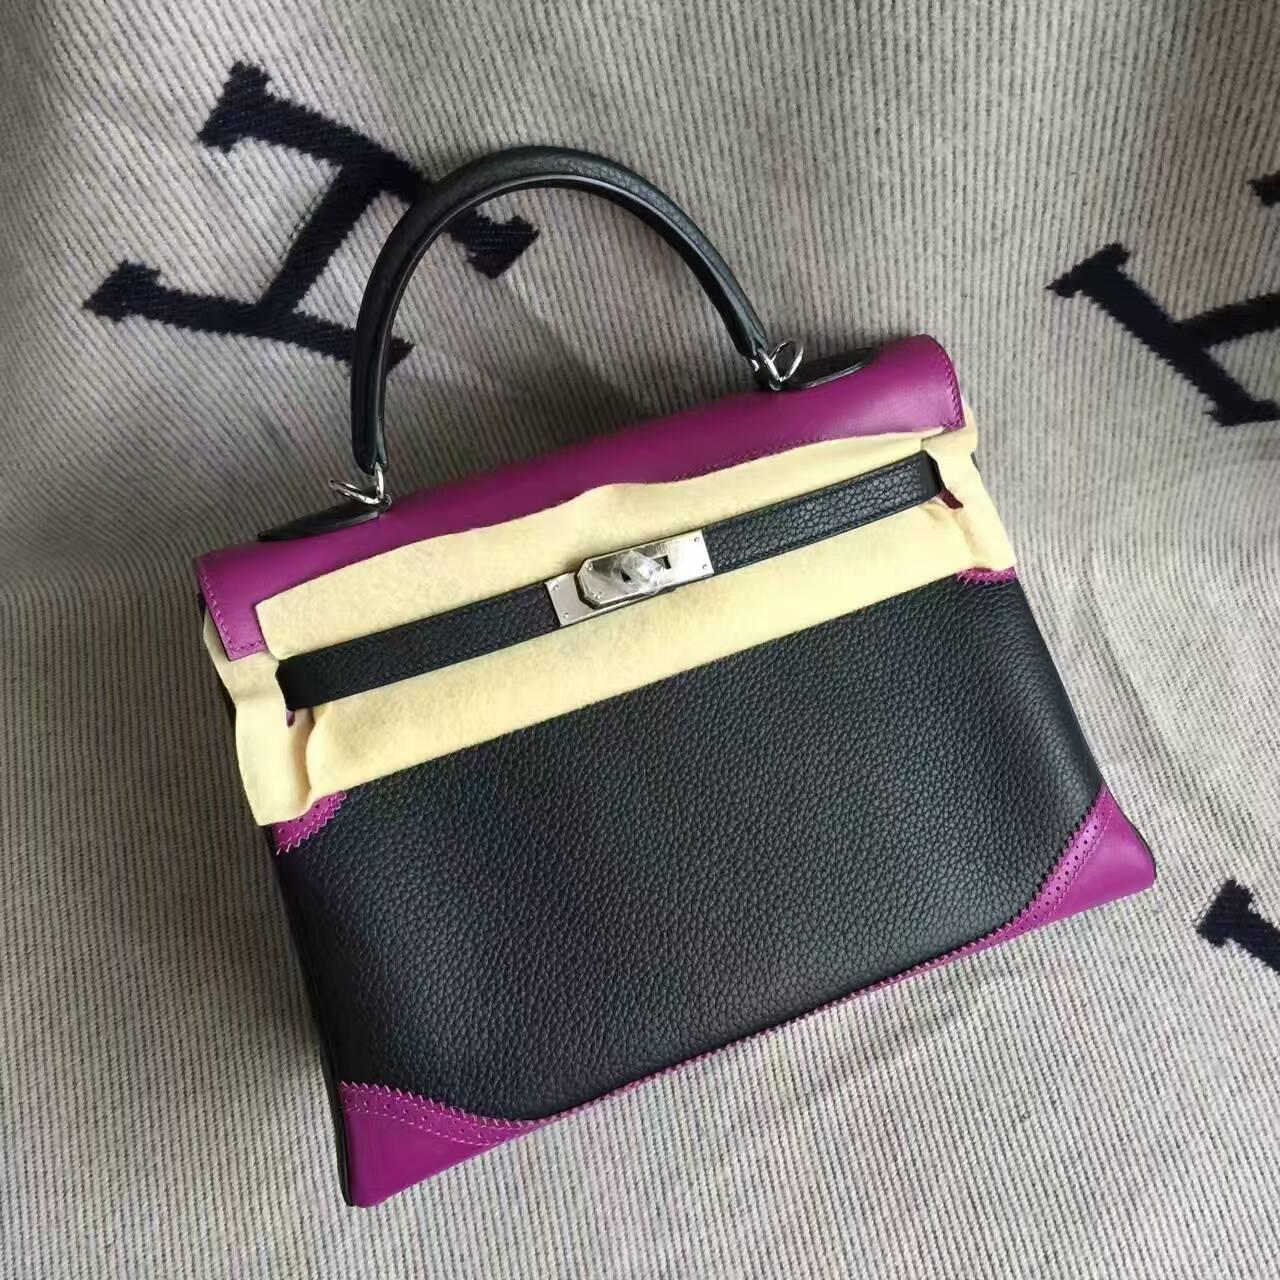 Sale Hermes Ghillie Kelly Bag32CM in Black & Purple Togo Calfskin Leather